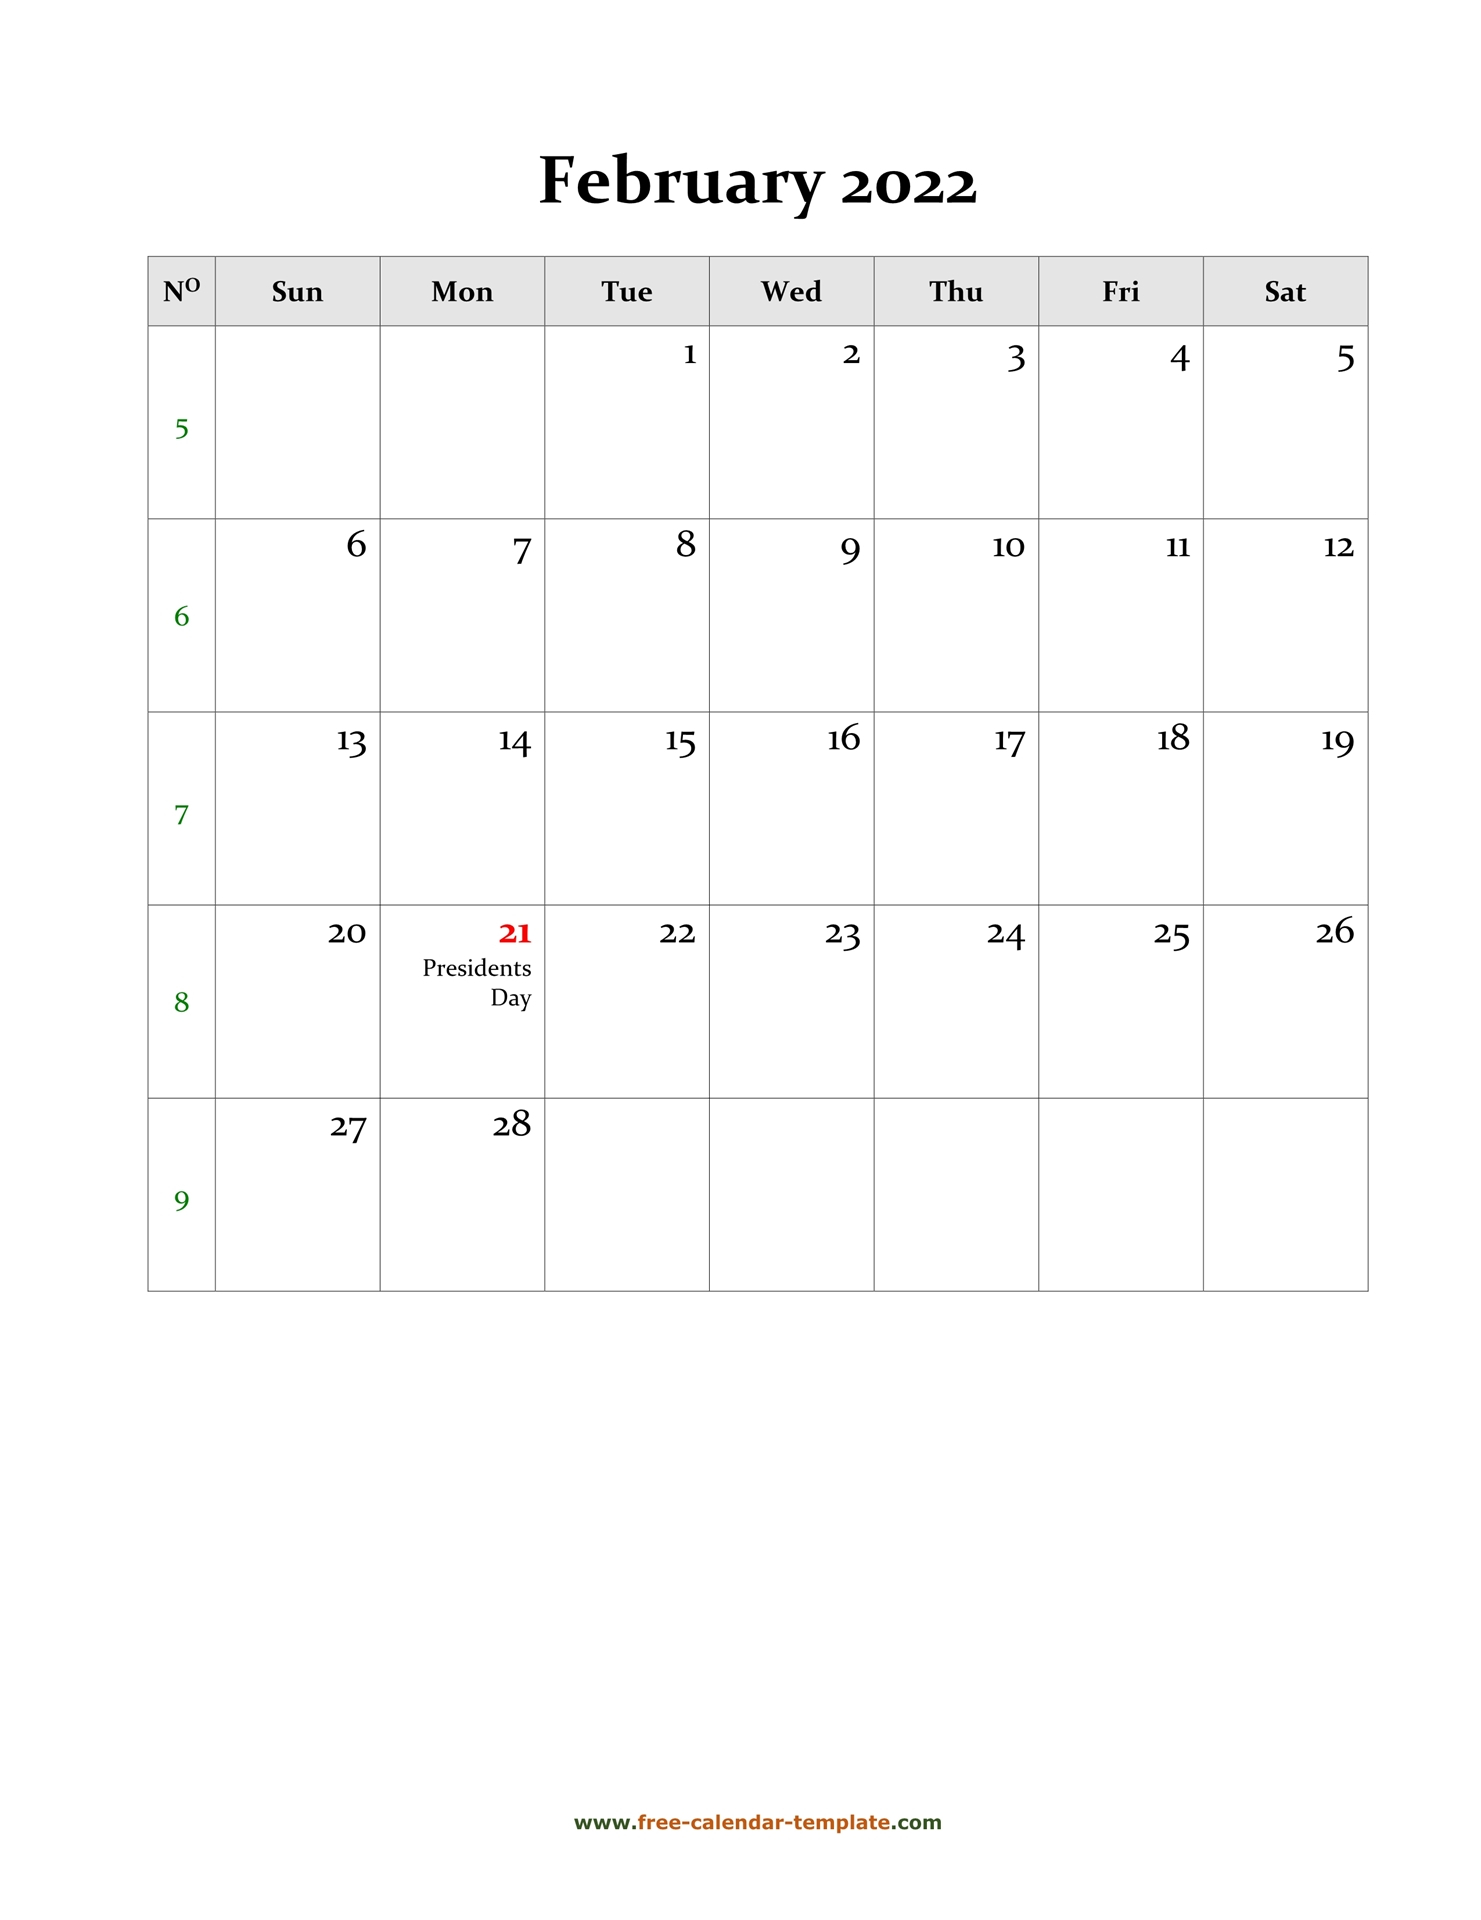 February 2022 Free Calendar Tempplate   Free Calendar Throughout 2022 Free Big Primt For Feb 2022